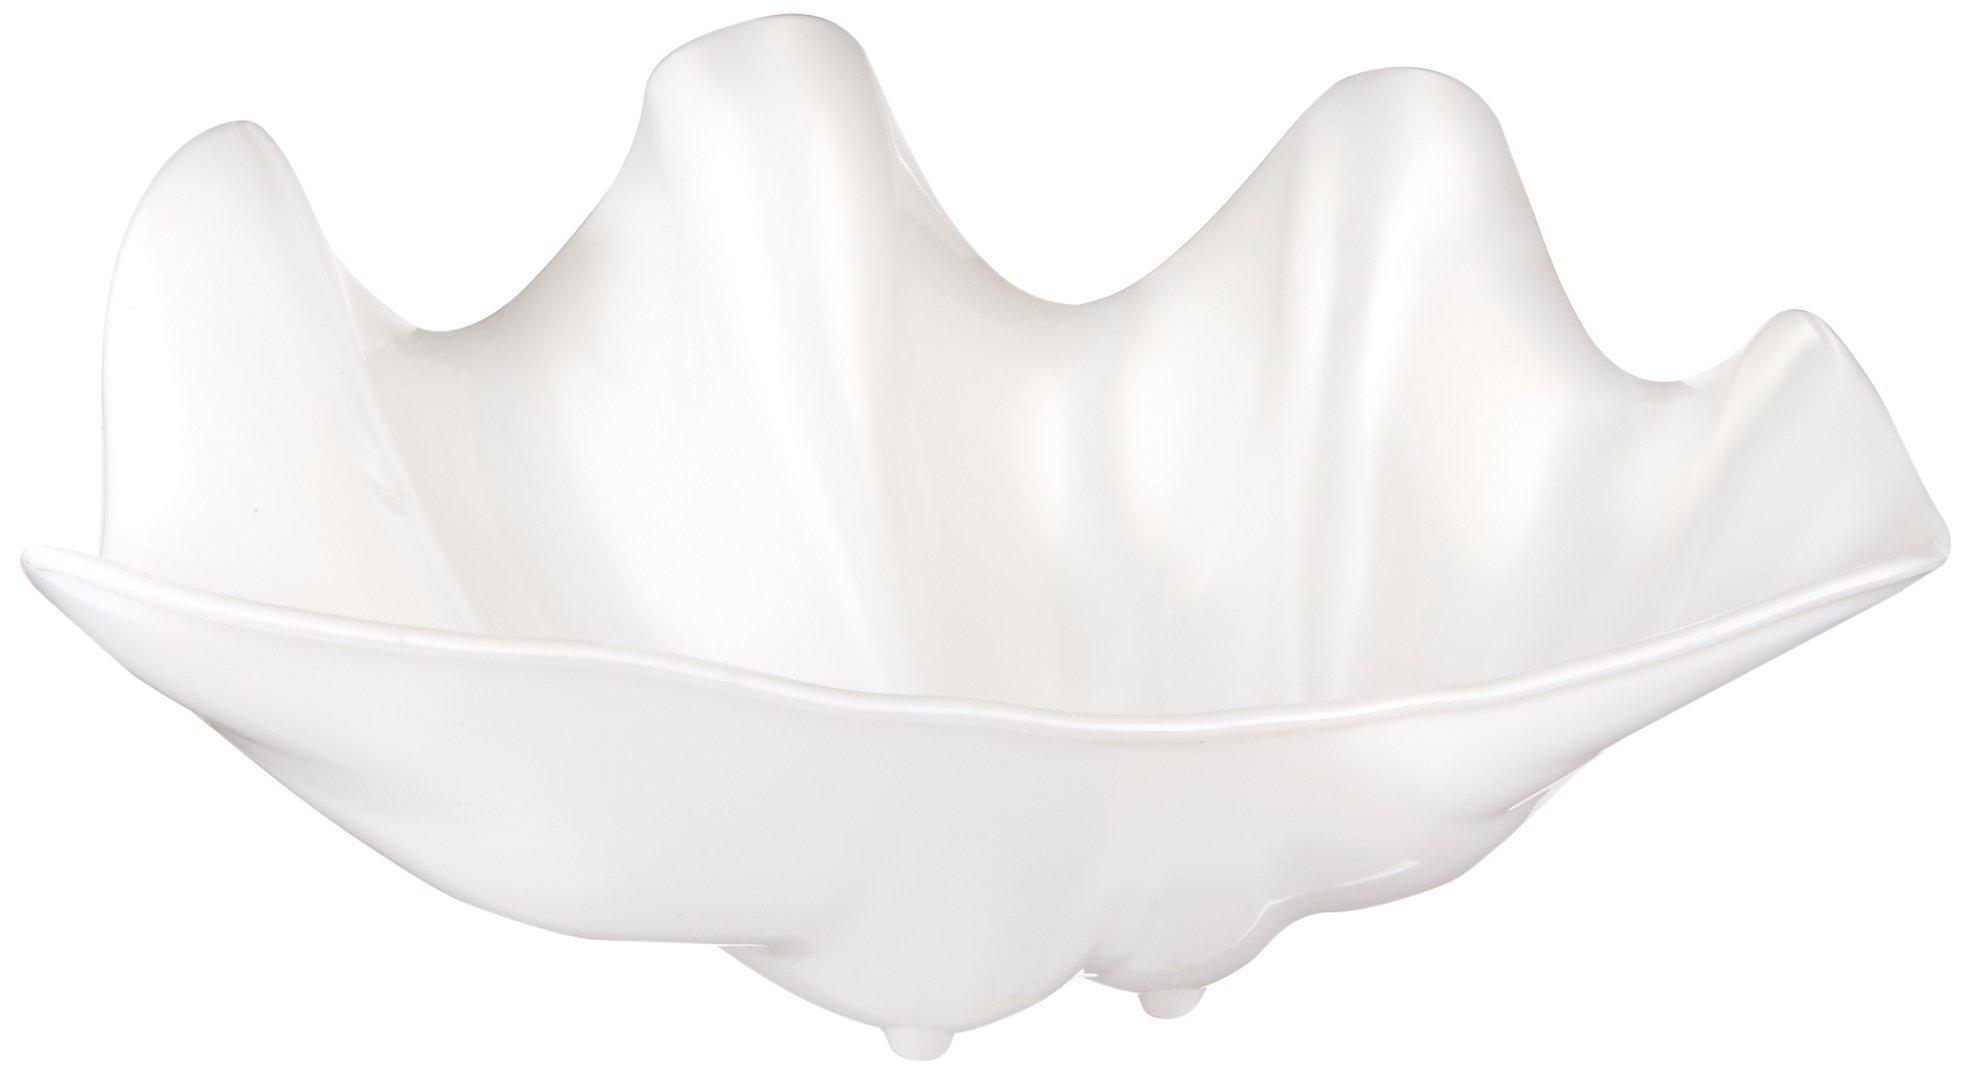 Winco PSBW-5W Shell Bowls, 5-Quart, Pearl